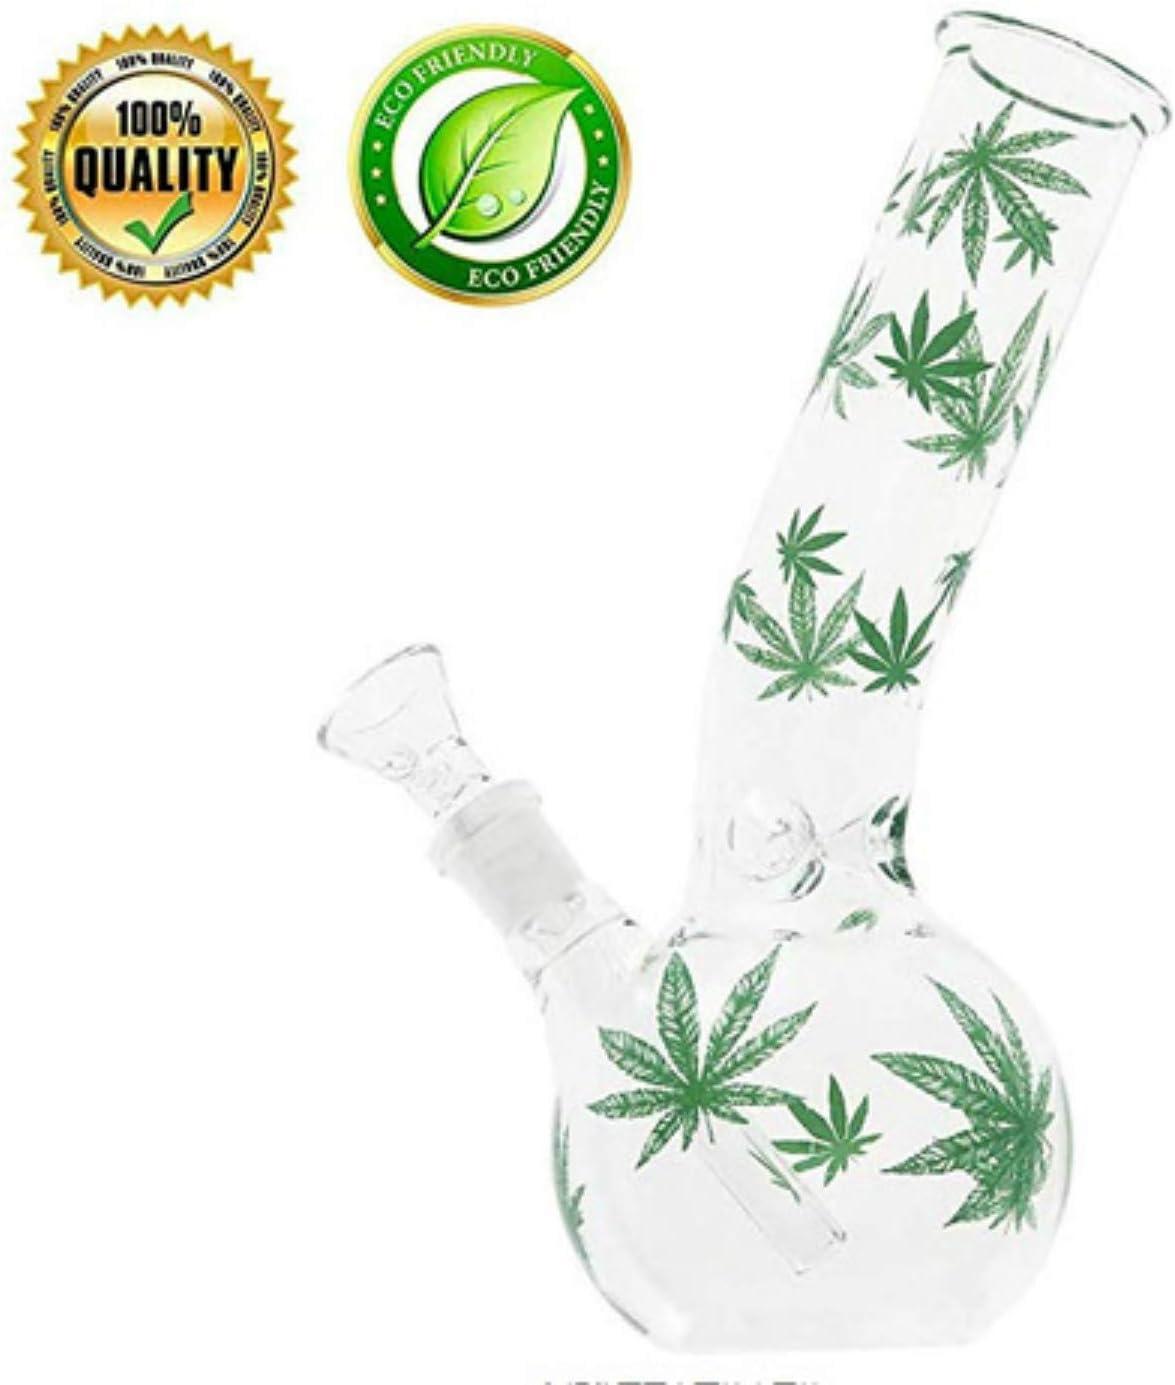 Kiwini Handmade Leaf Pattern Glass Crafts Water Beaker 7.5 Inch Green